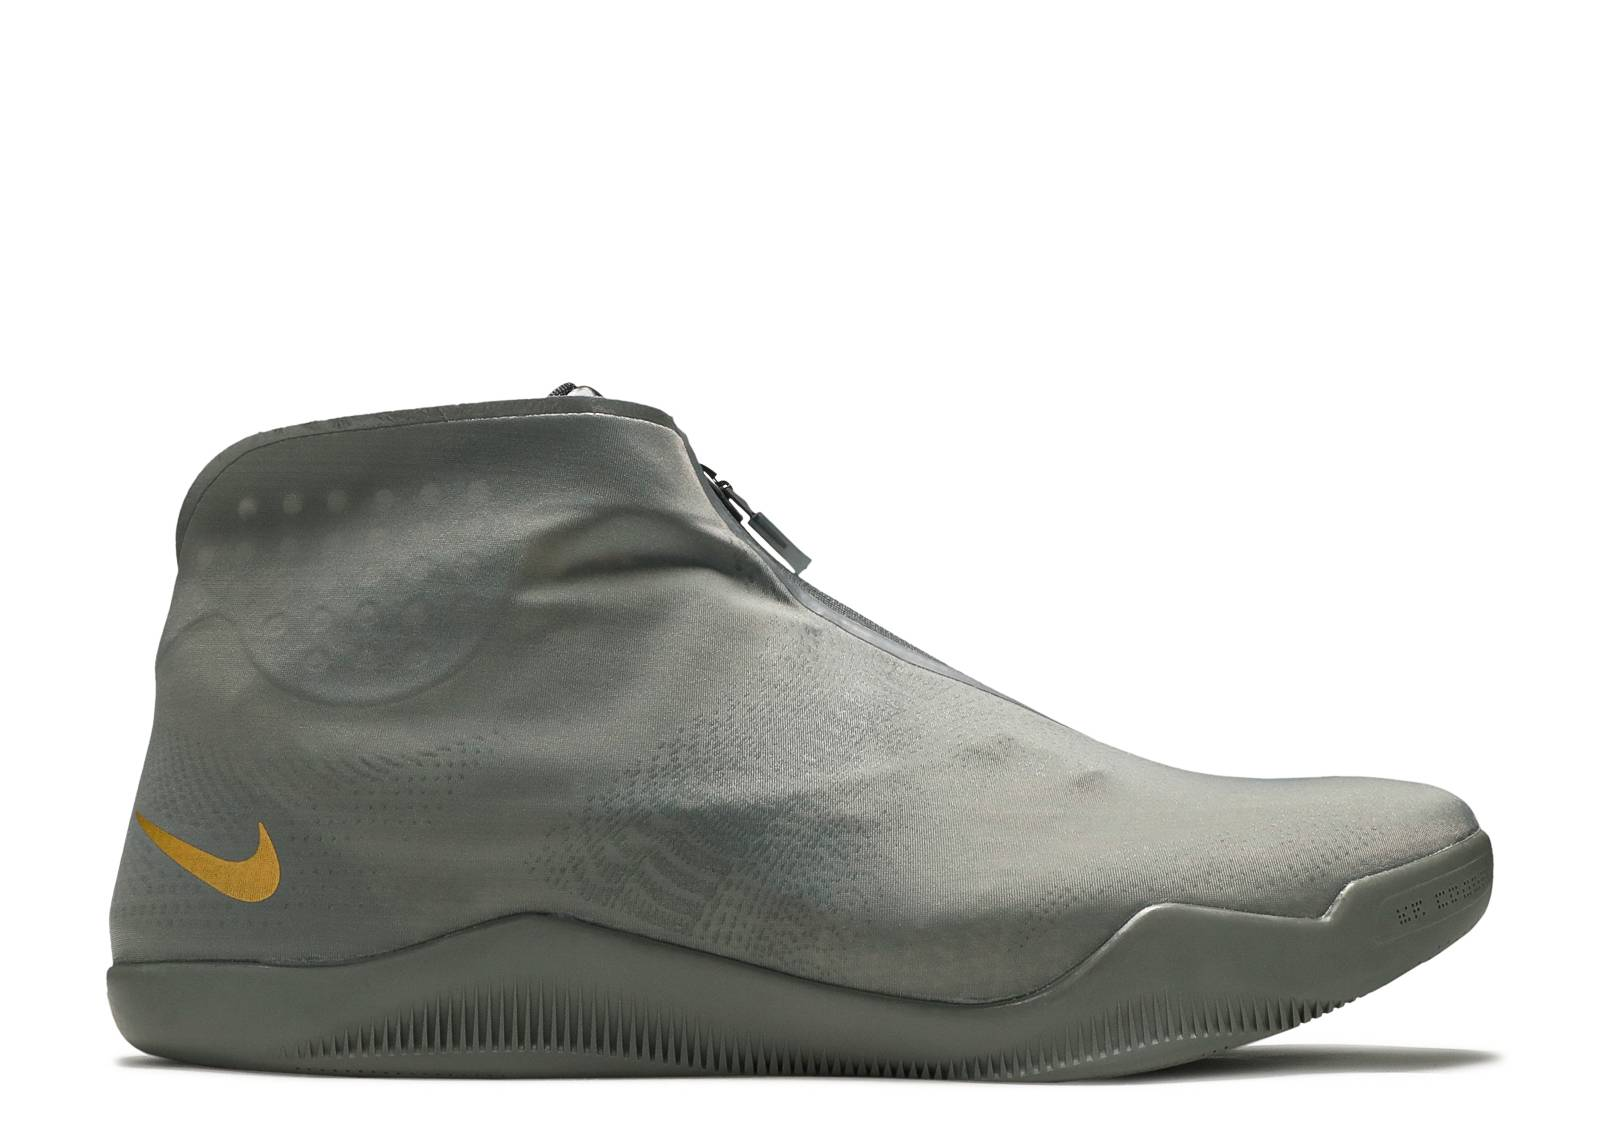 2dbd6f7a6961 Nike Kobe 11 Alt